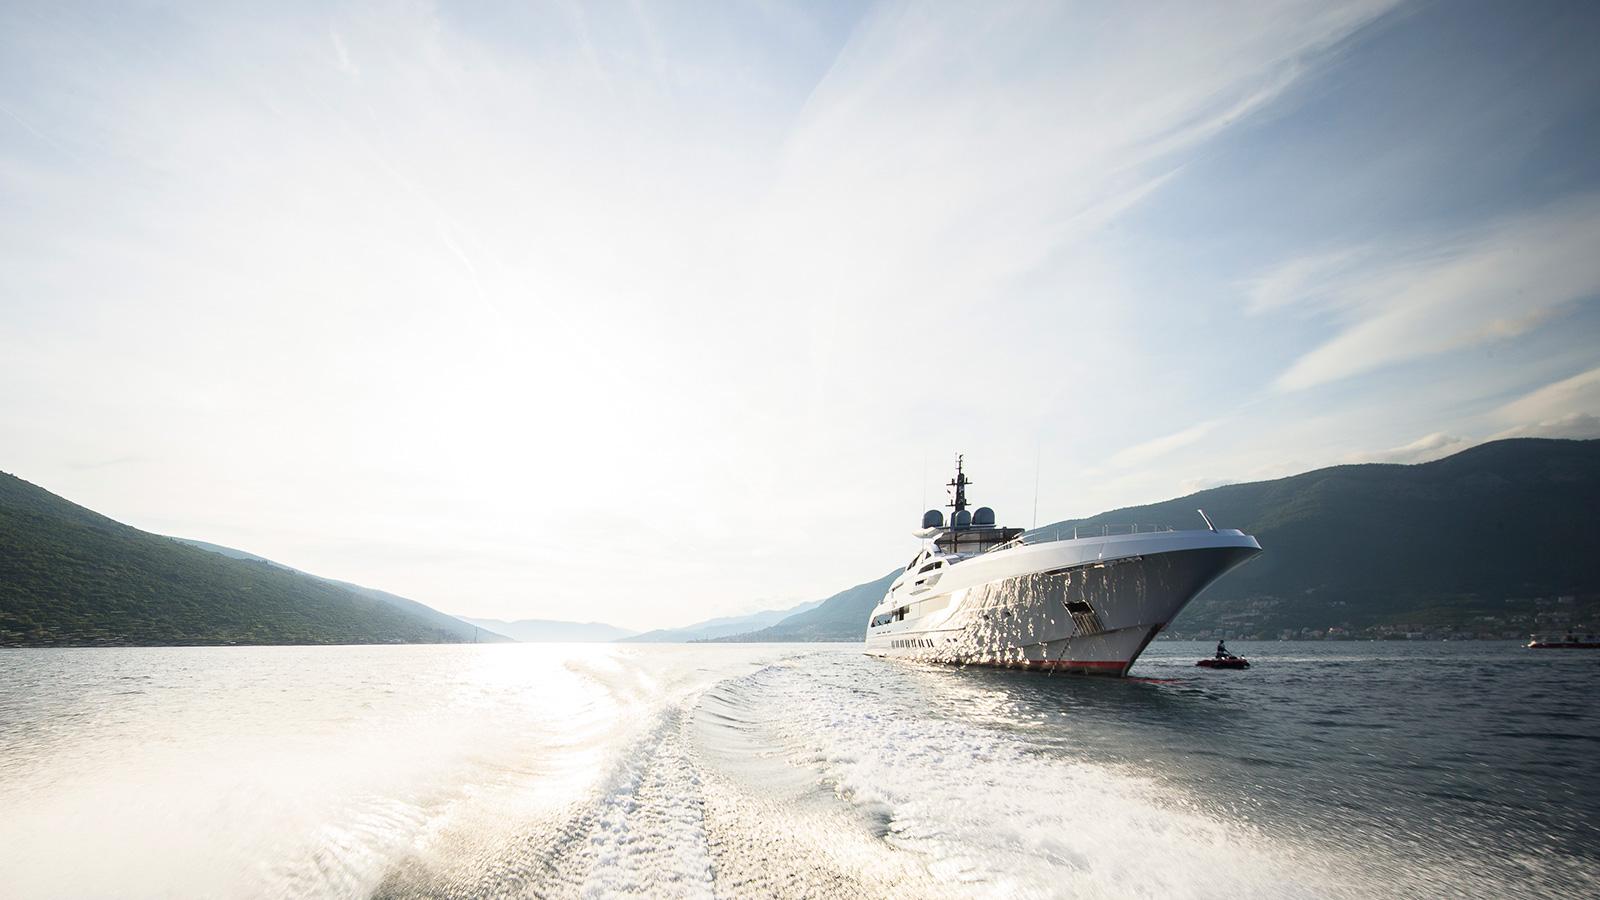 view-from-the-tender-of-heesen-flagship-yacht-galactica-super-nova